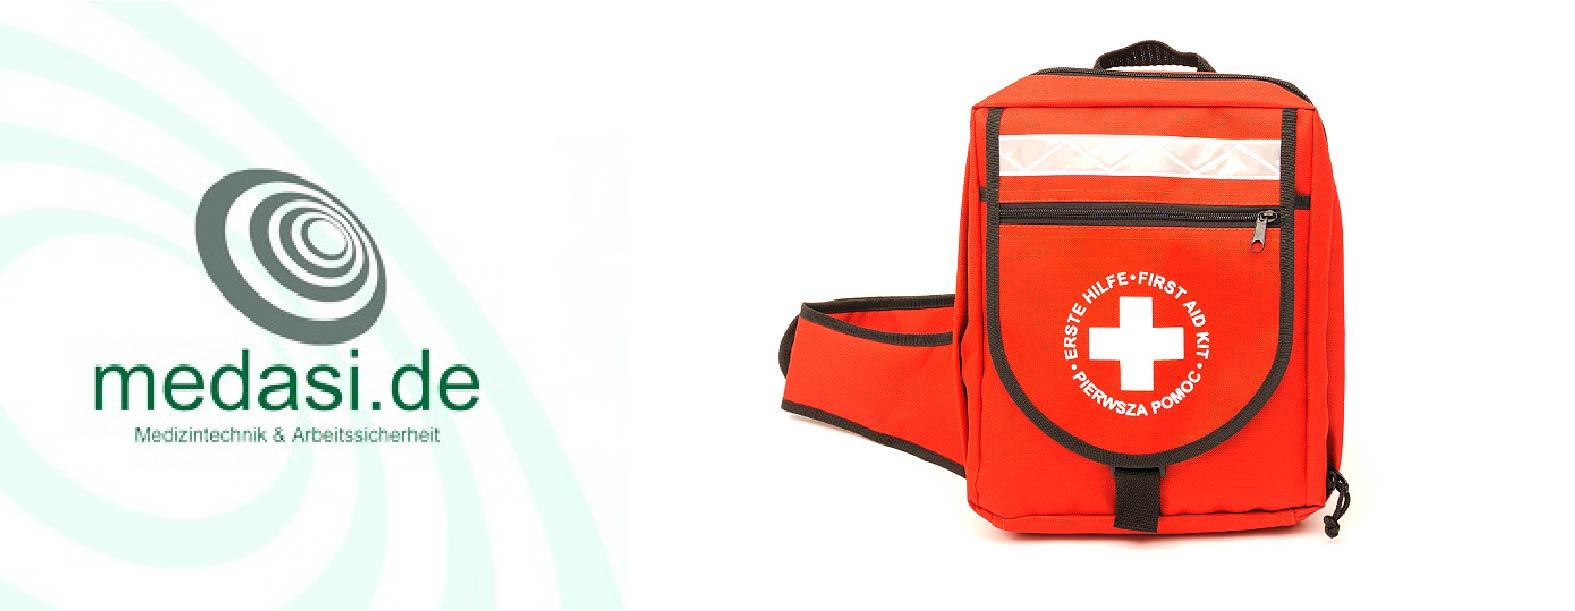 Erste-Hilfe-Notfallrucksäcke